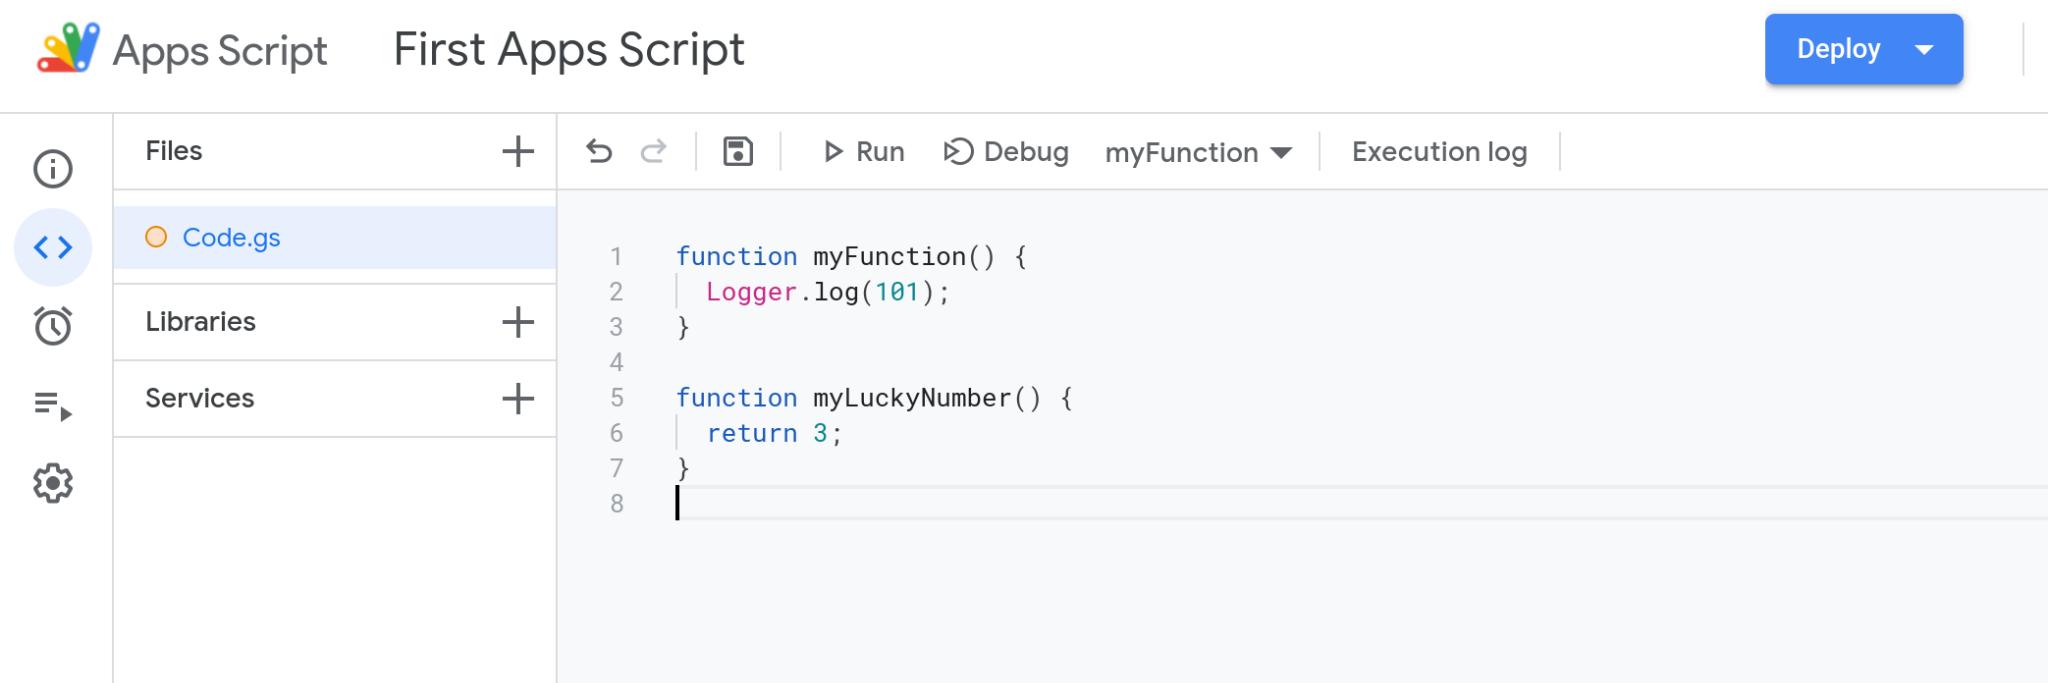 Screenshot of the Google Apps Script code editor.